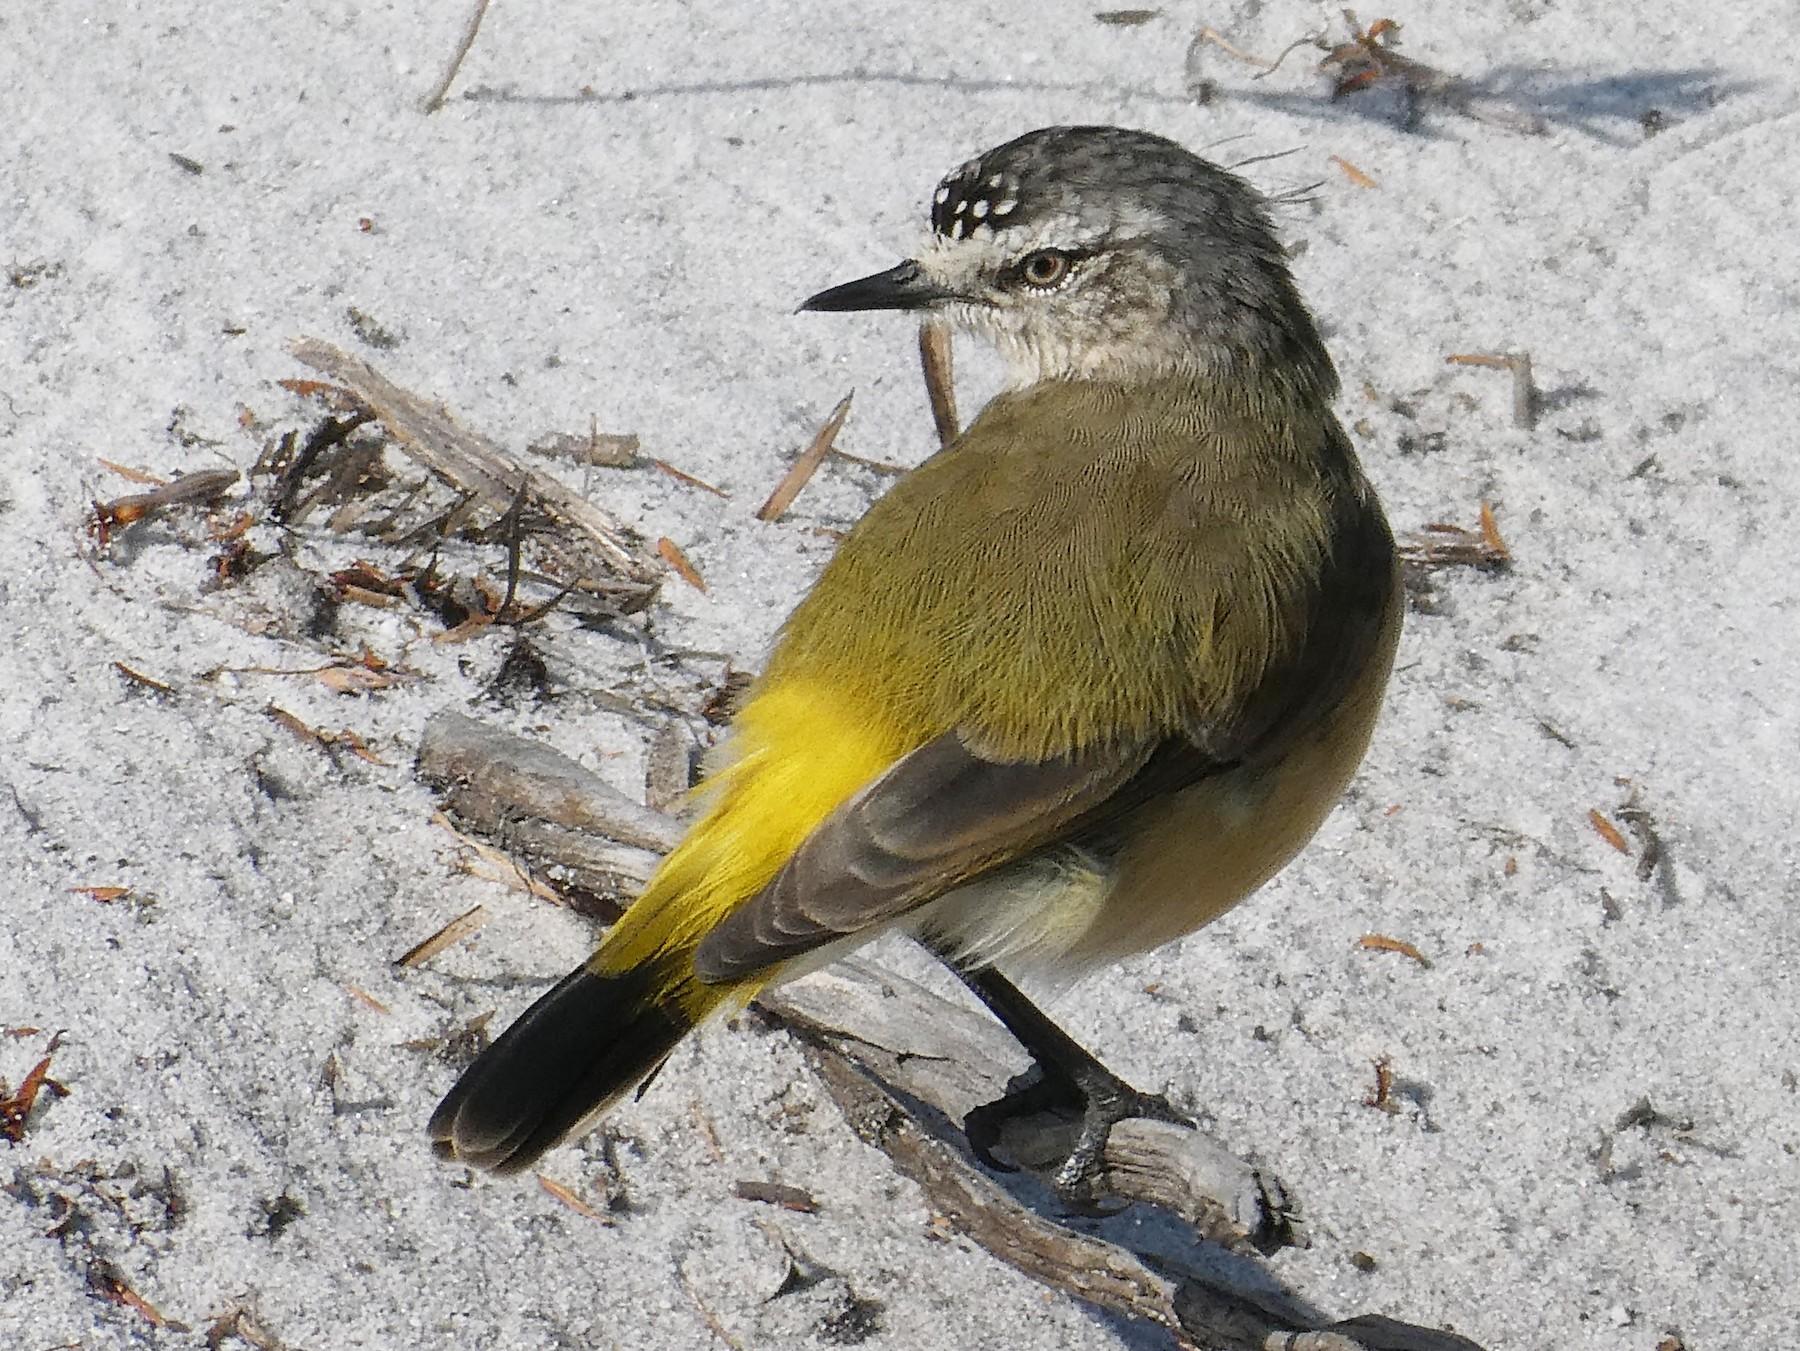 Yellow-rumped Thornbill - Shelley Altman